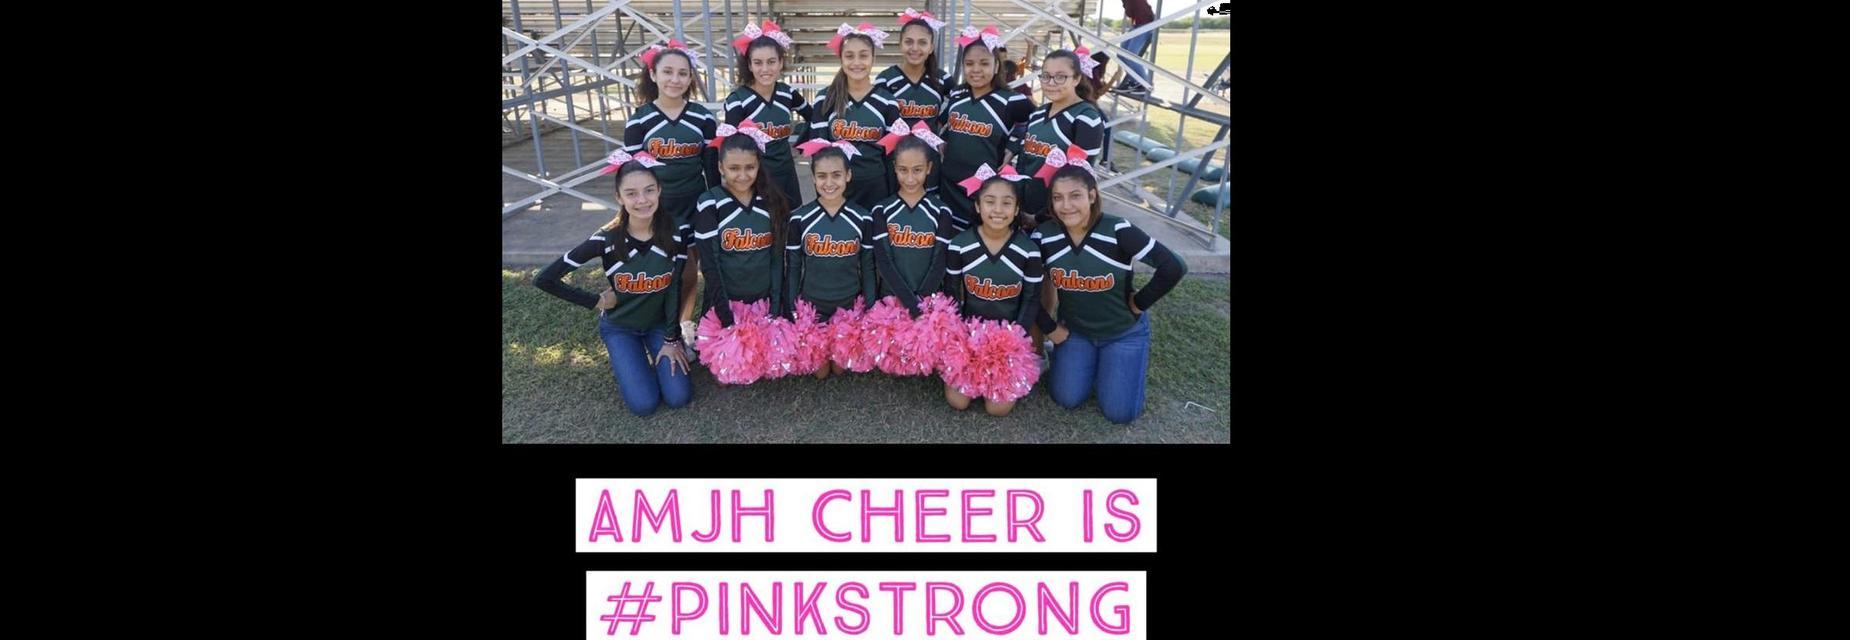 #PinkStrong